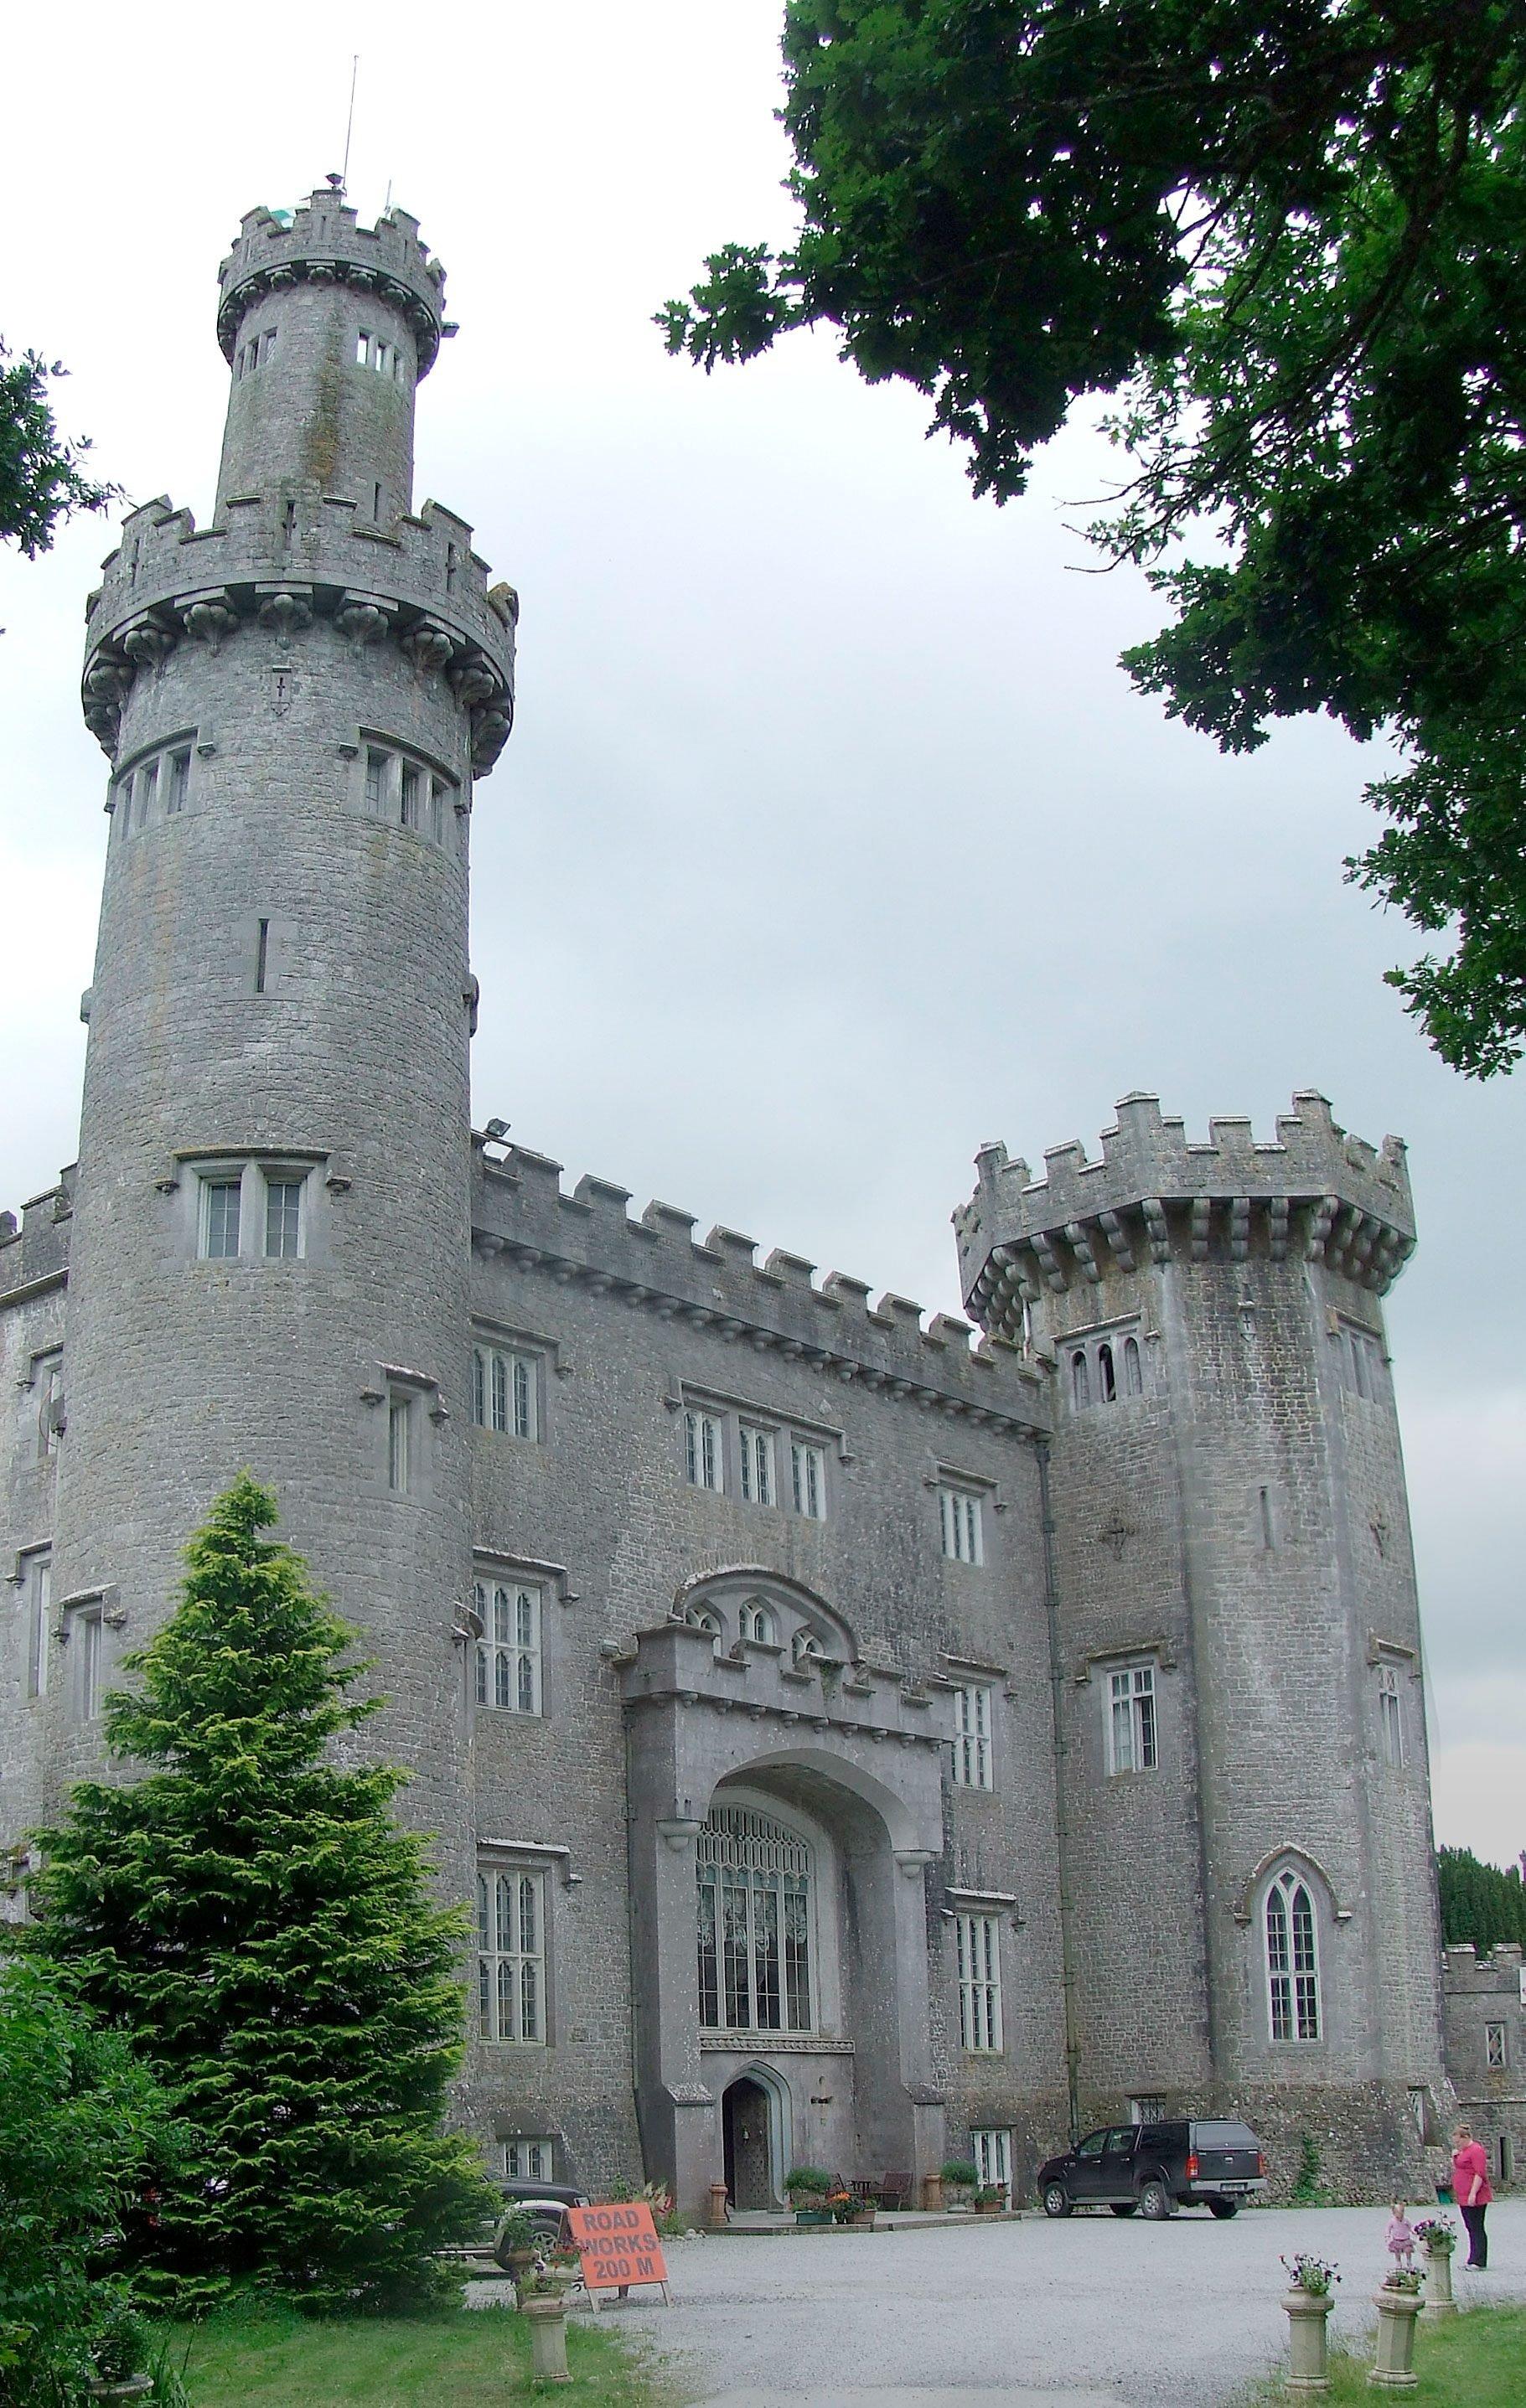 charleville castle exterior